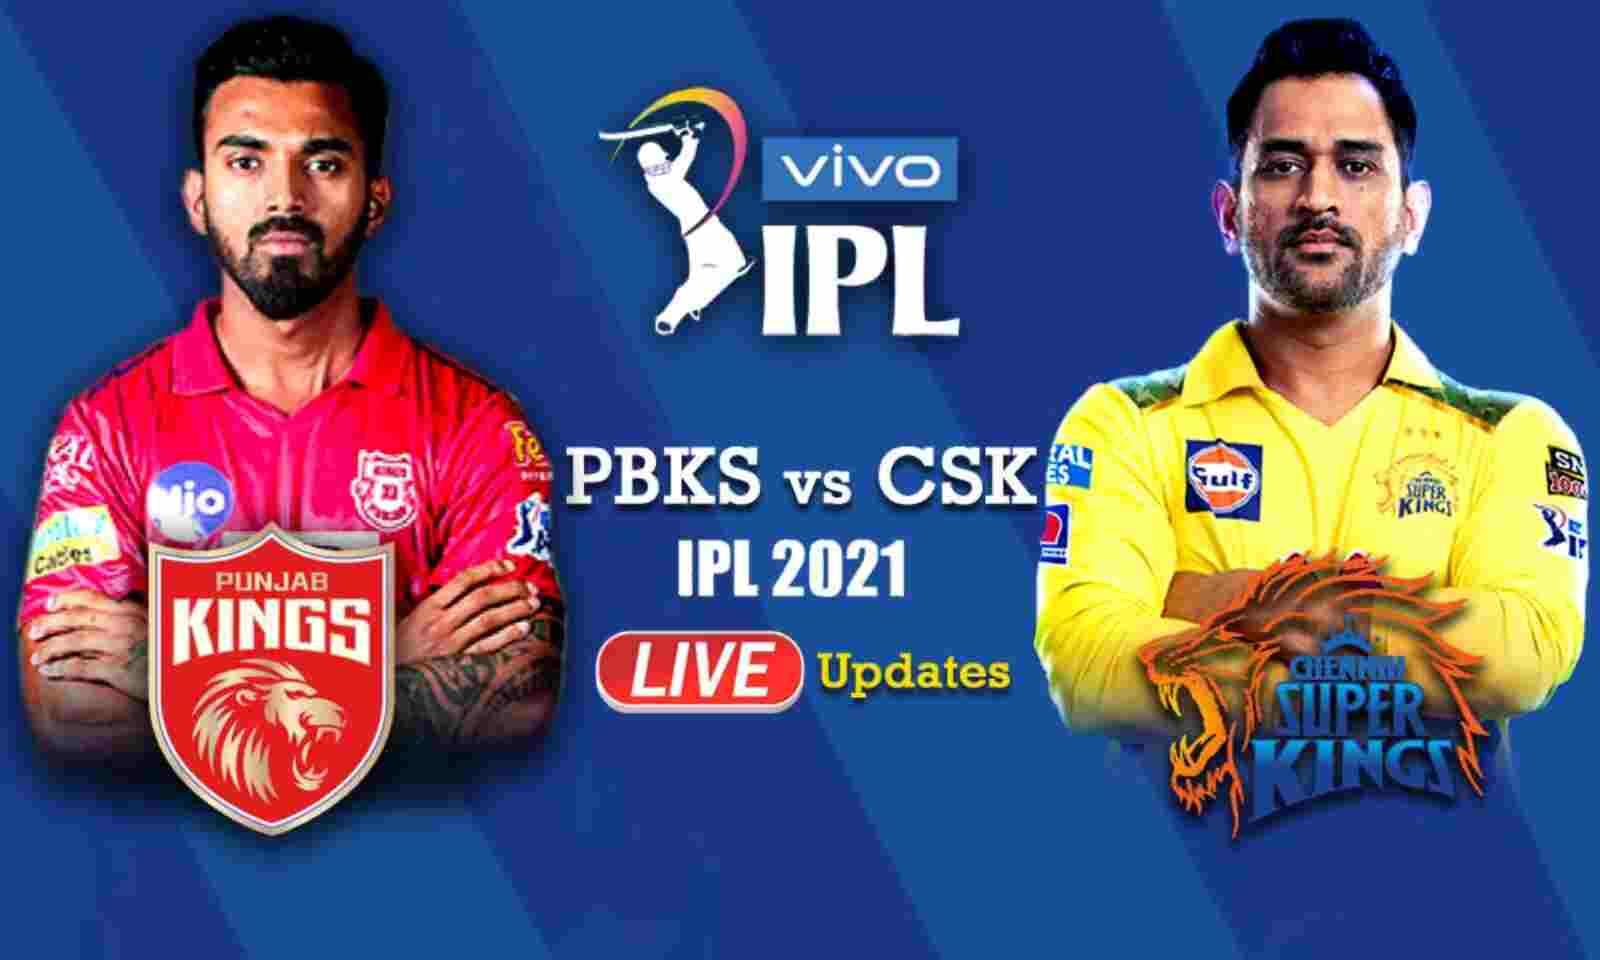 PBKS vs CSK IPL 2021 Live Score: Chennai Super Kings won by 6 wickets